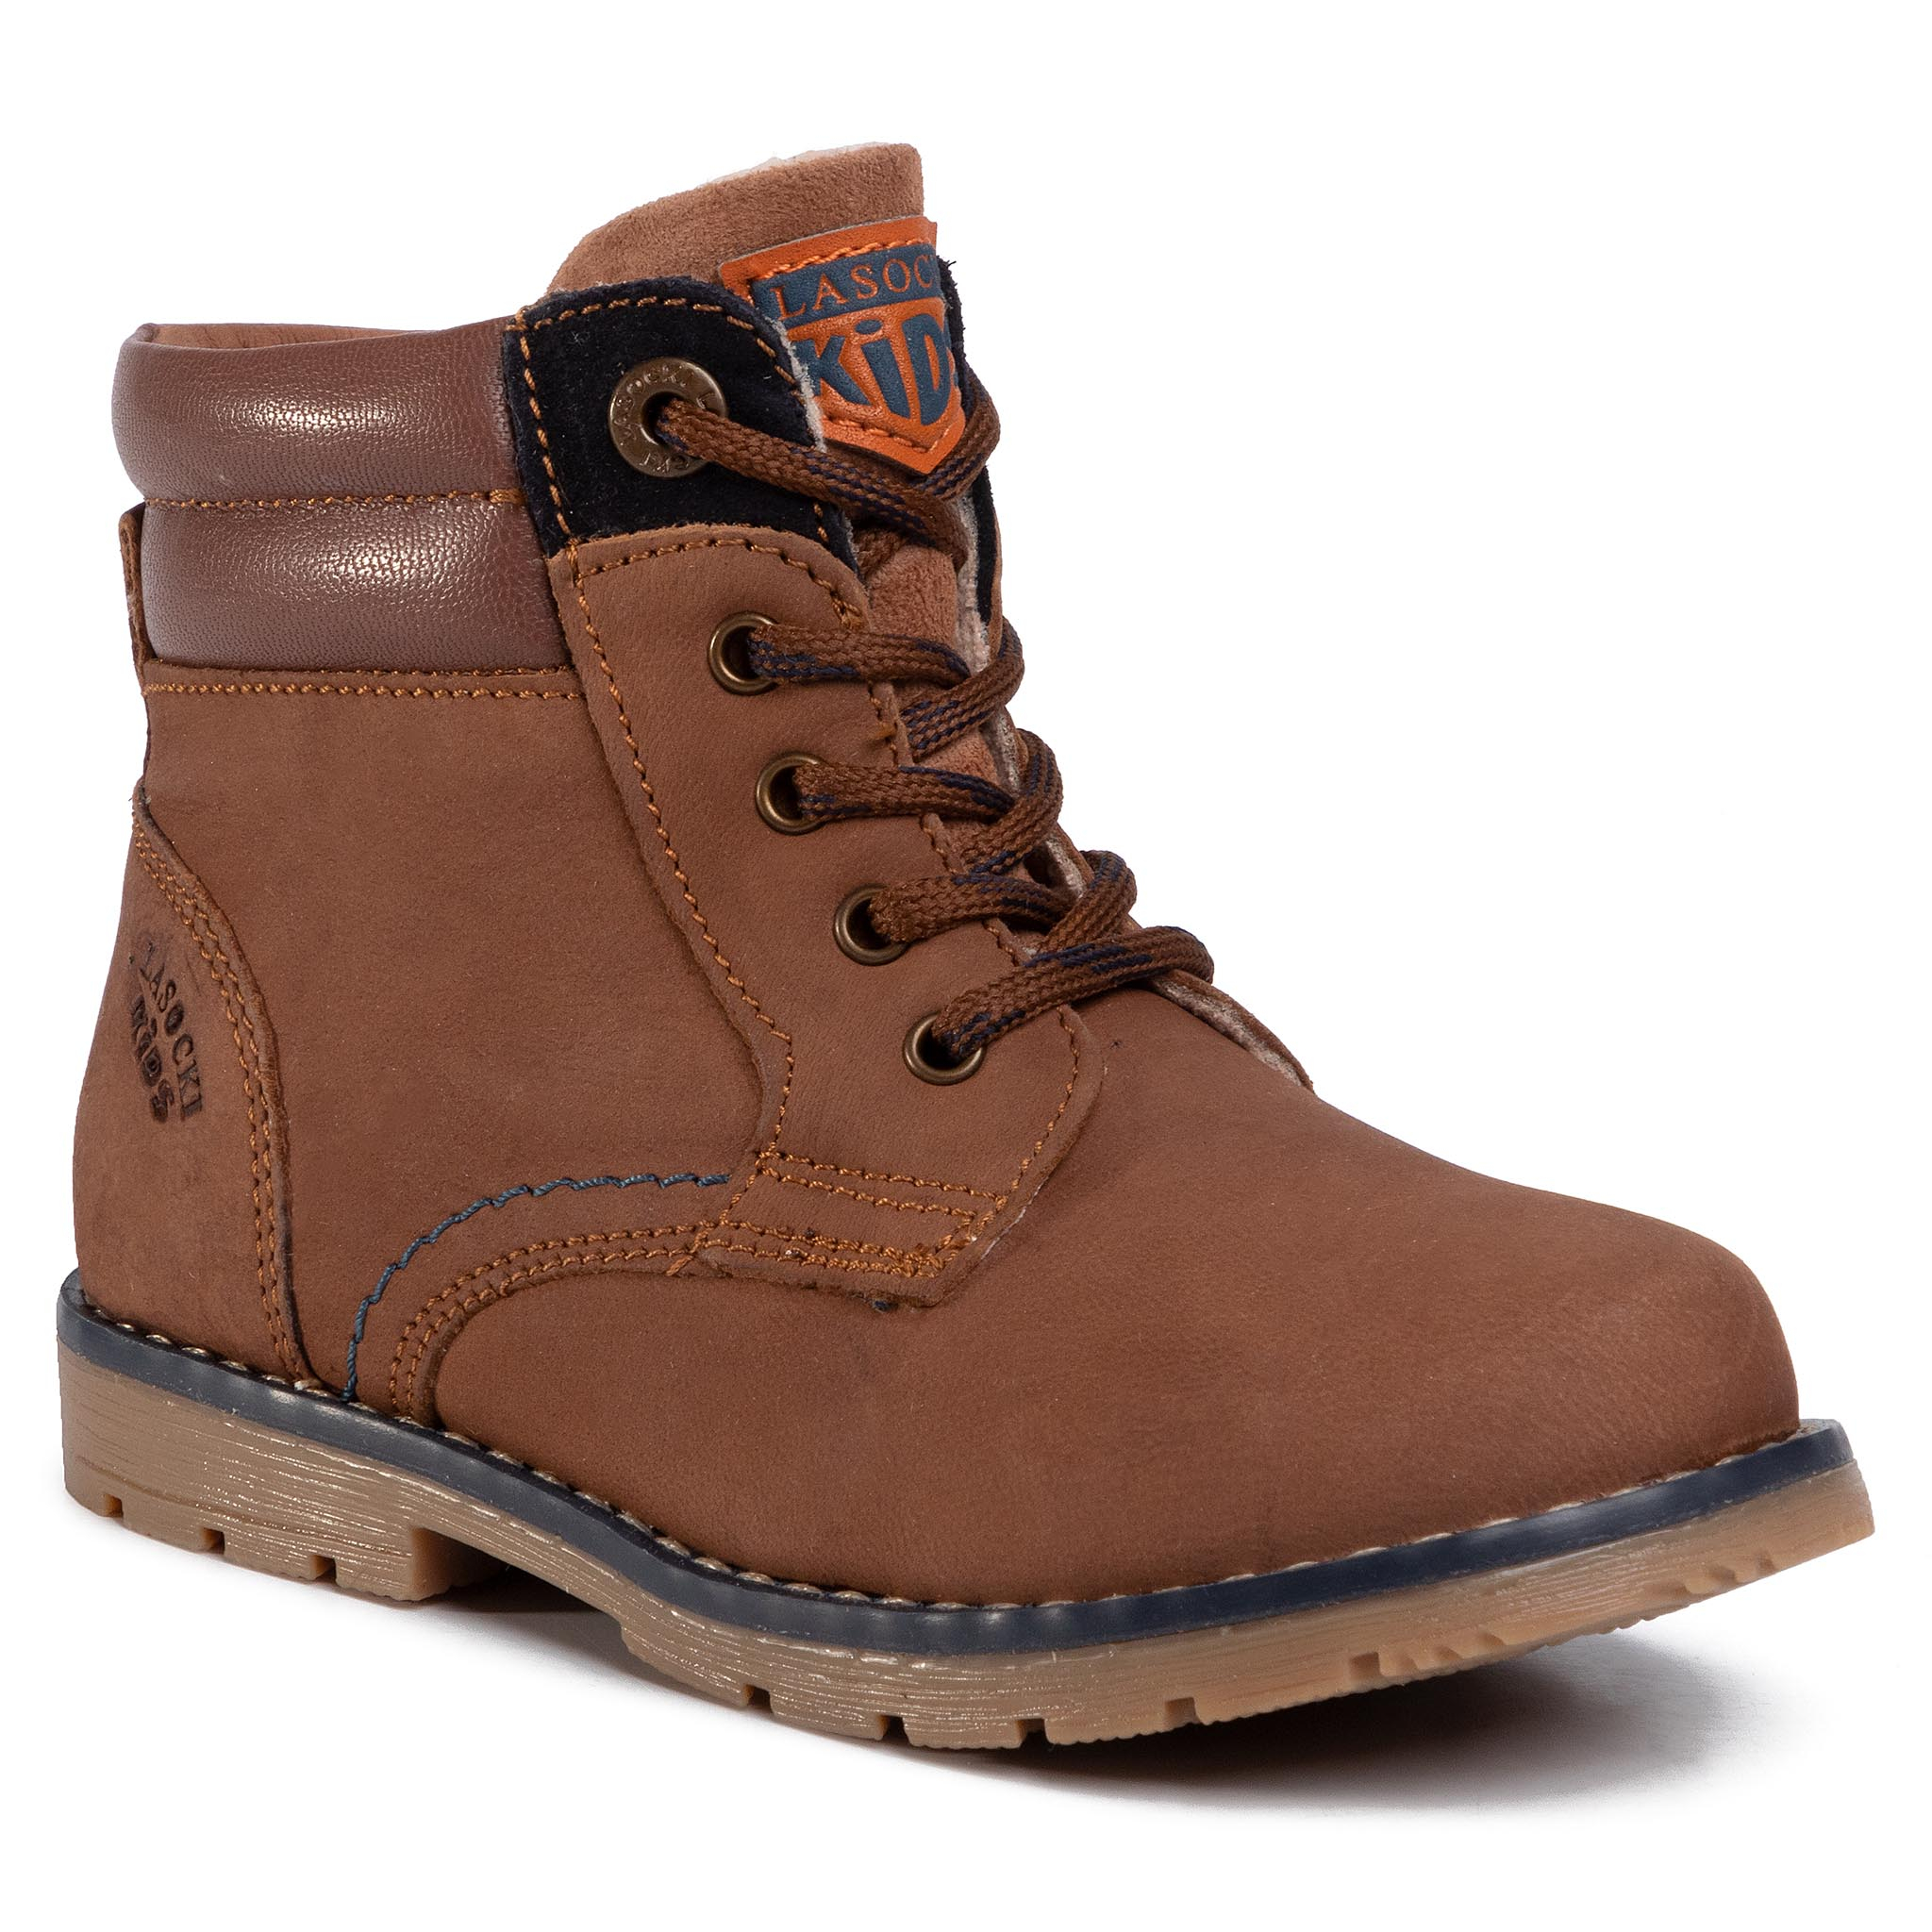 Outdoorová obuv LASOCKI KIDS - CI12-KEEKY-04 Brown